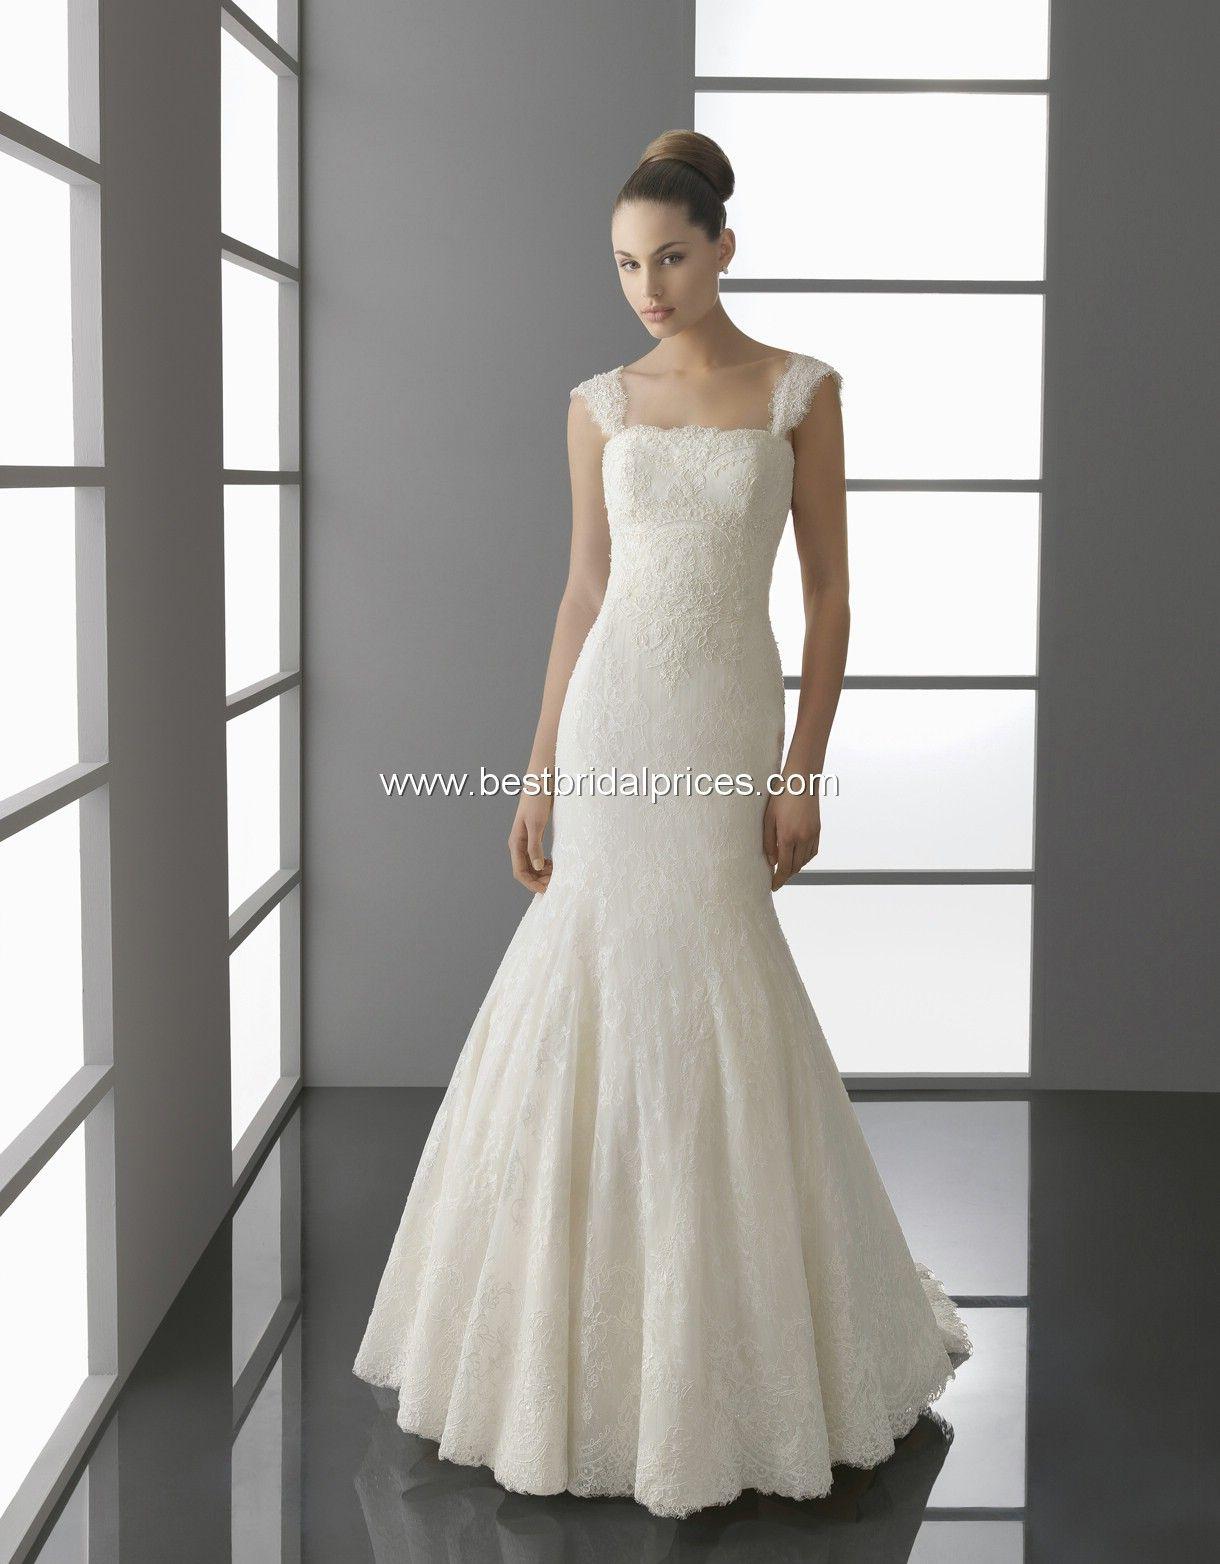 Aire barcelona wedding dresses style palmira wedding ideas